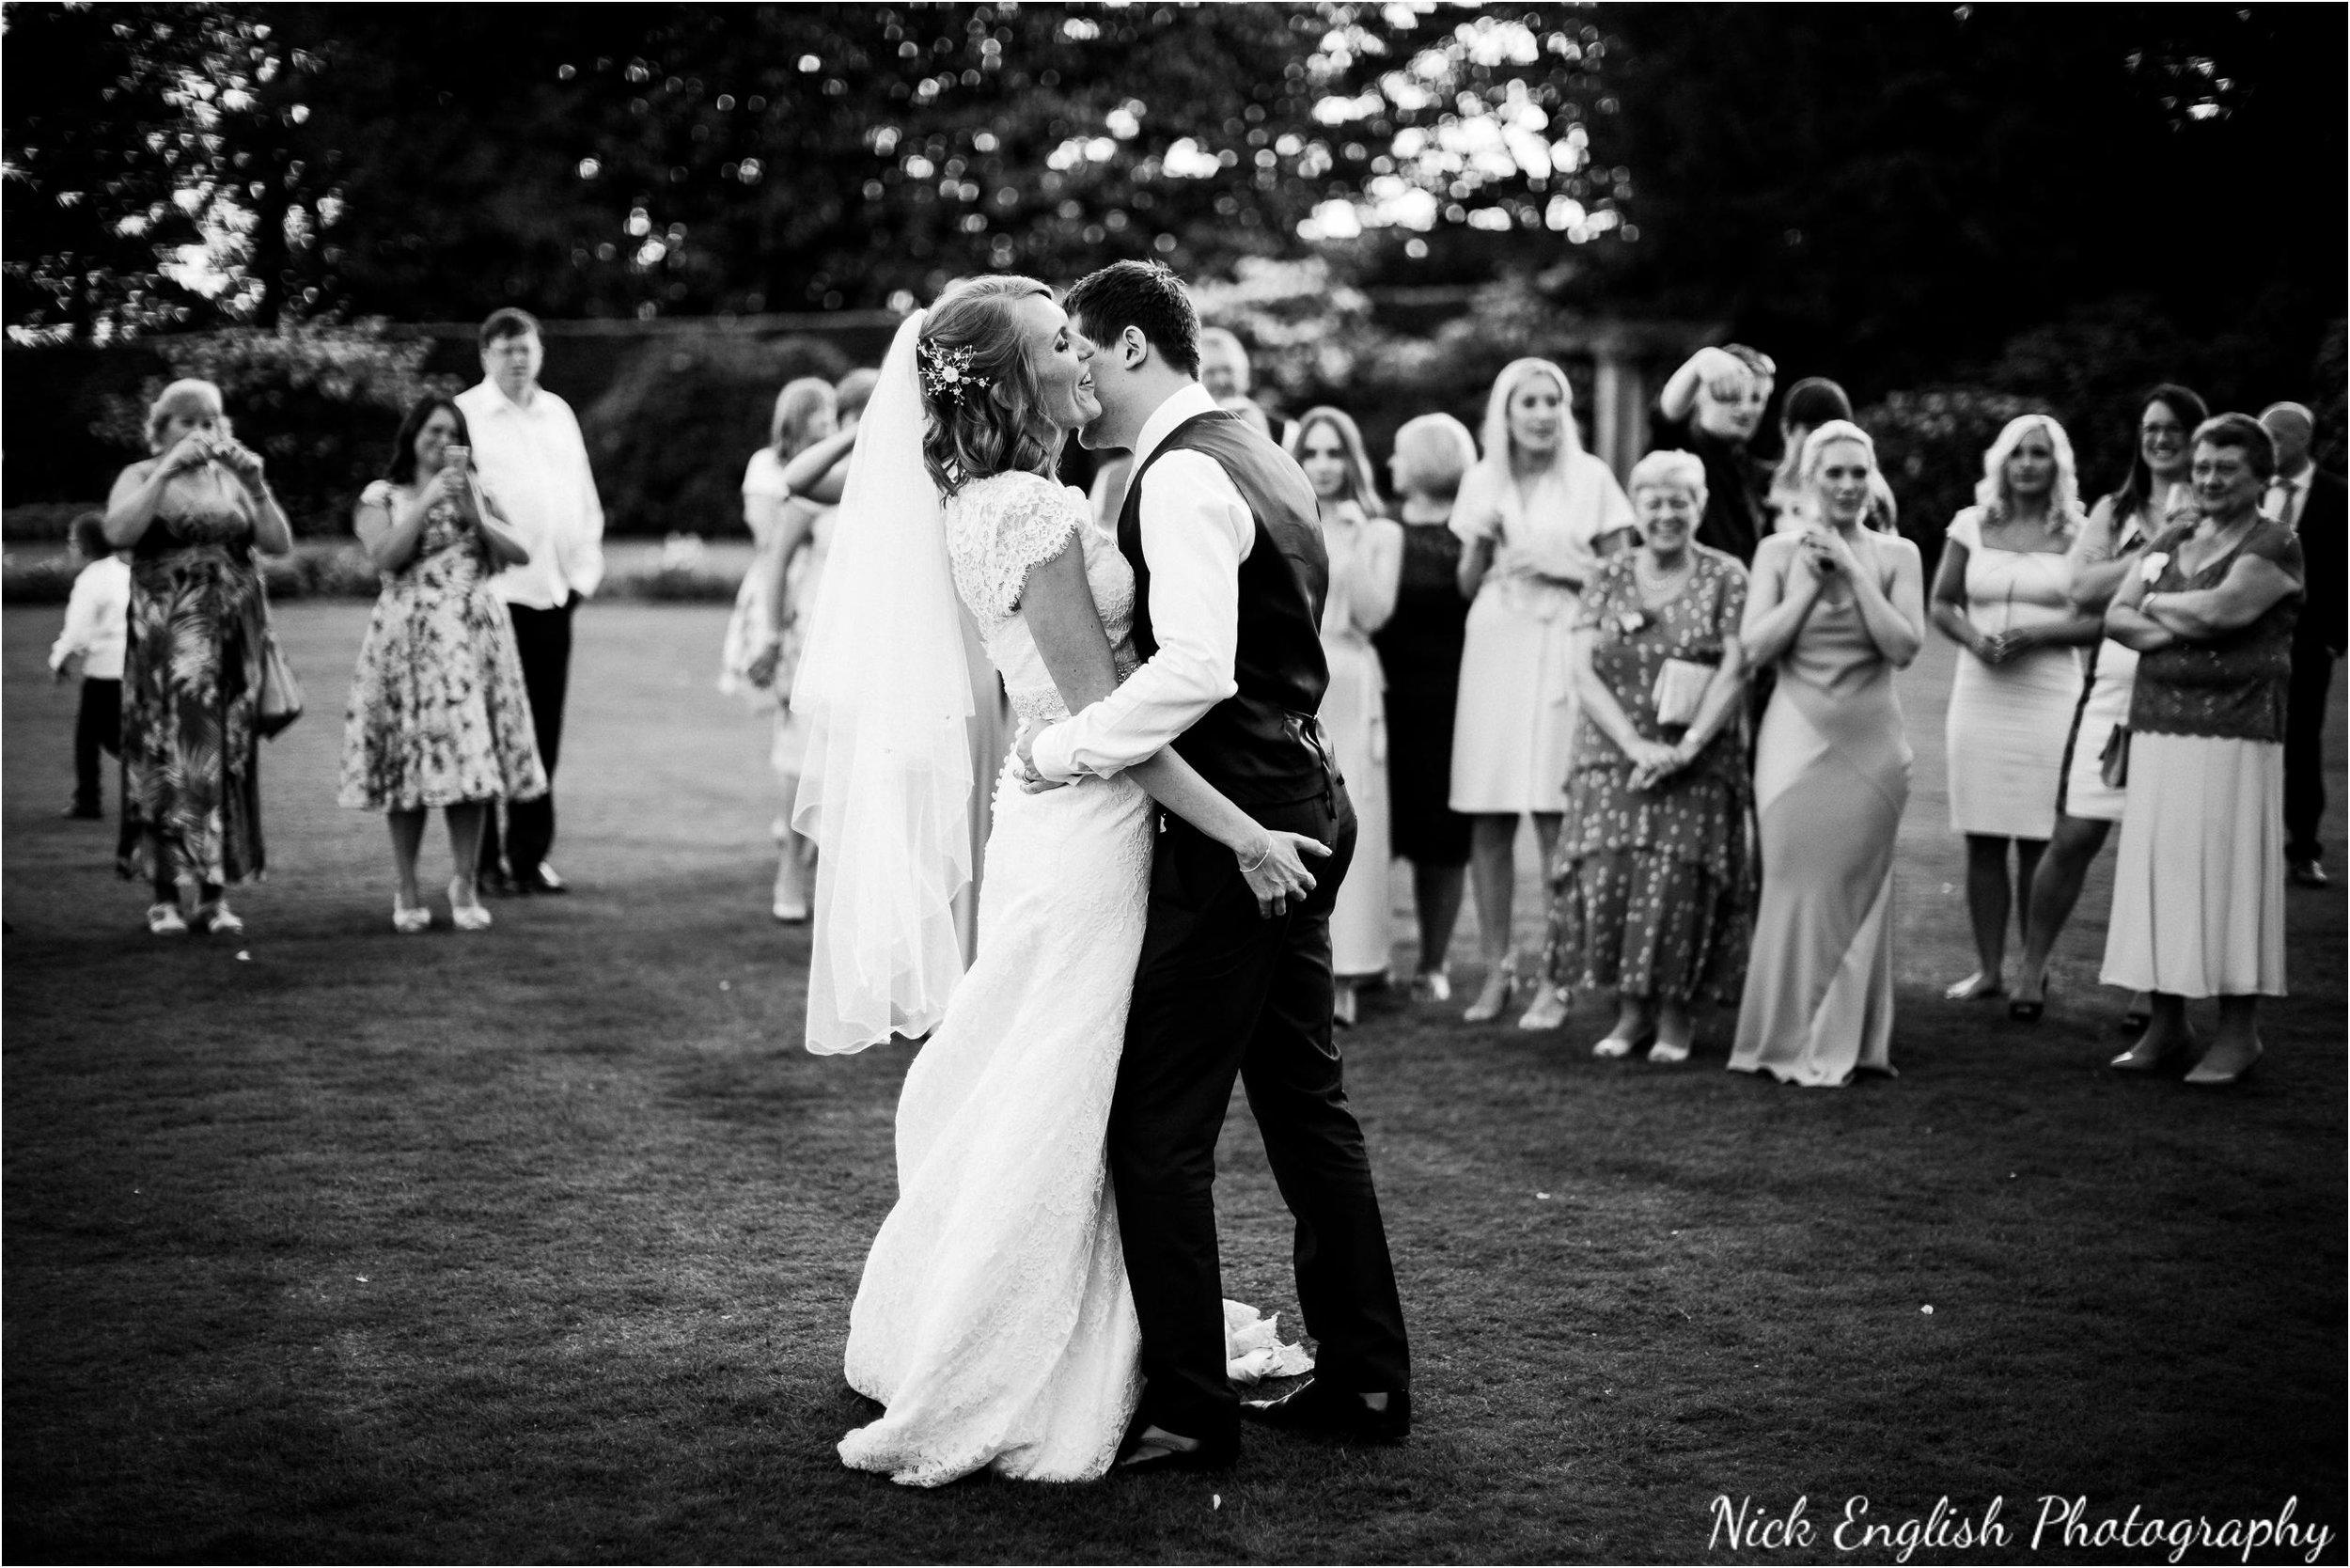 Alison James Wedding Photographs at Eaves Hall West Bradford 240jpg.jpeg